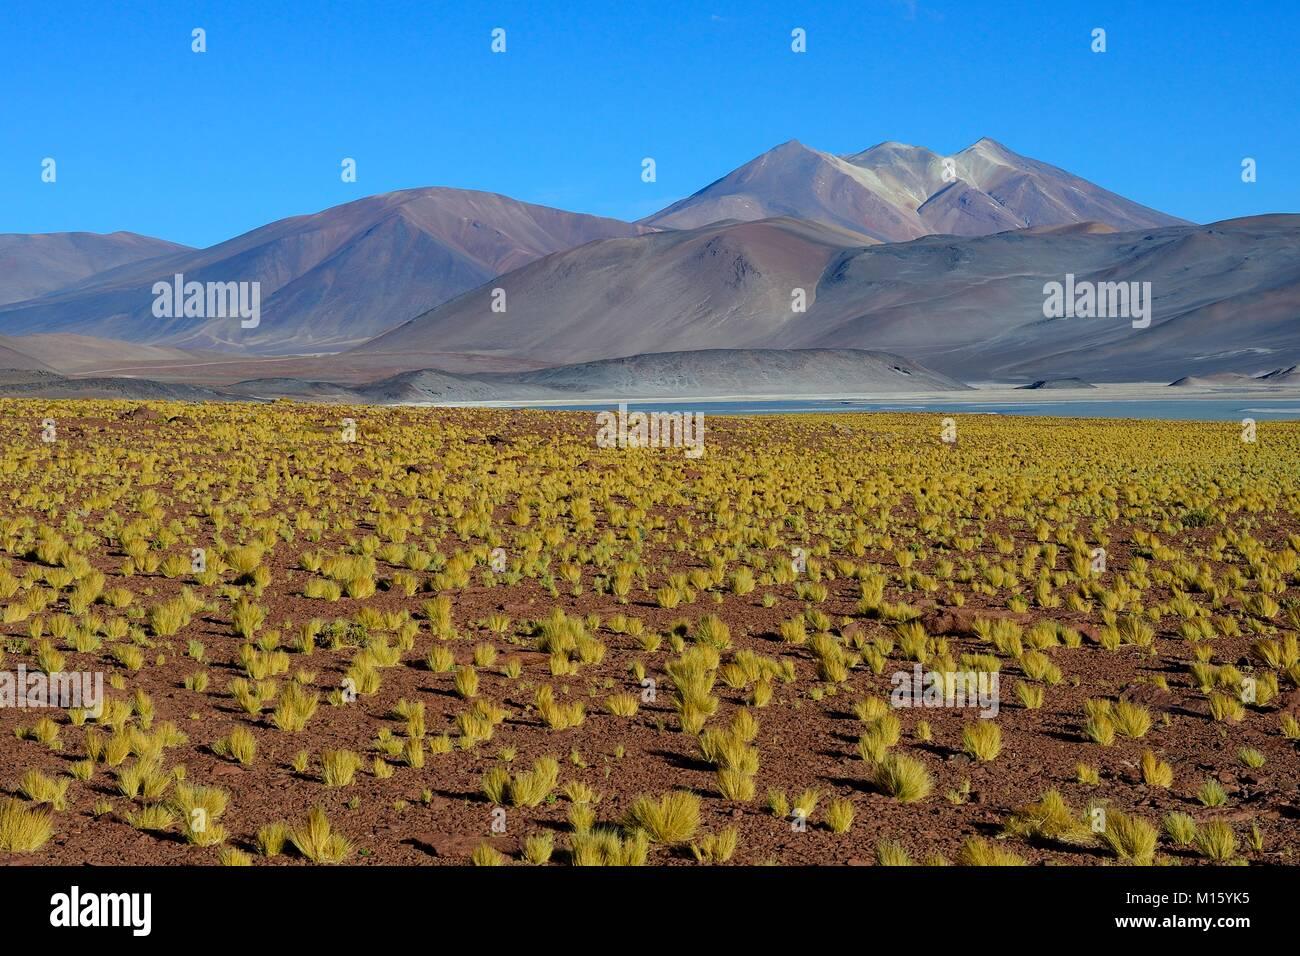 Lagune Salar de Talar mit kahlen Bergen Cerros de Incahuasi und Paso de Sica,Antofagasta Region,Chile - Stock Image